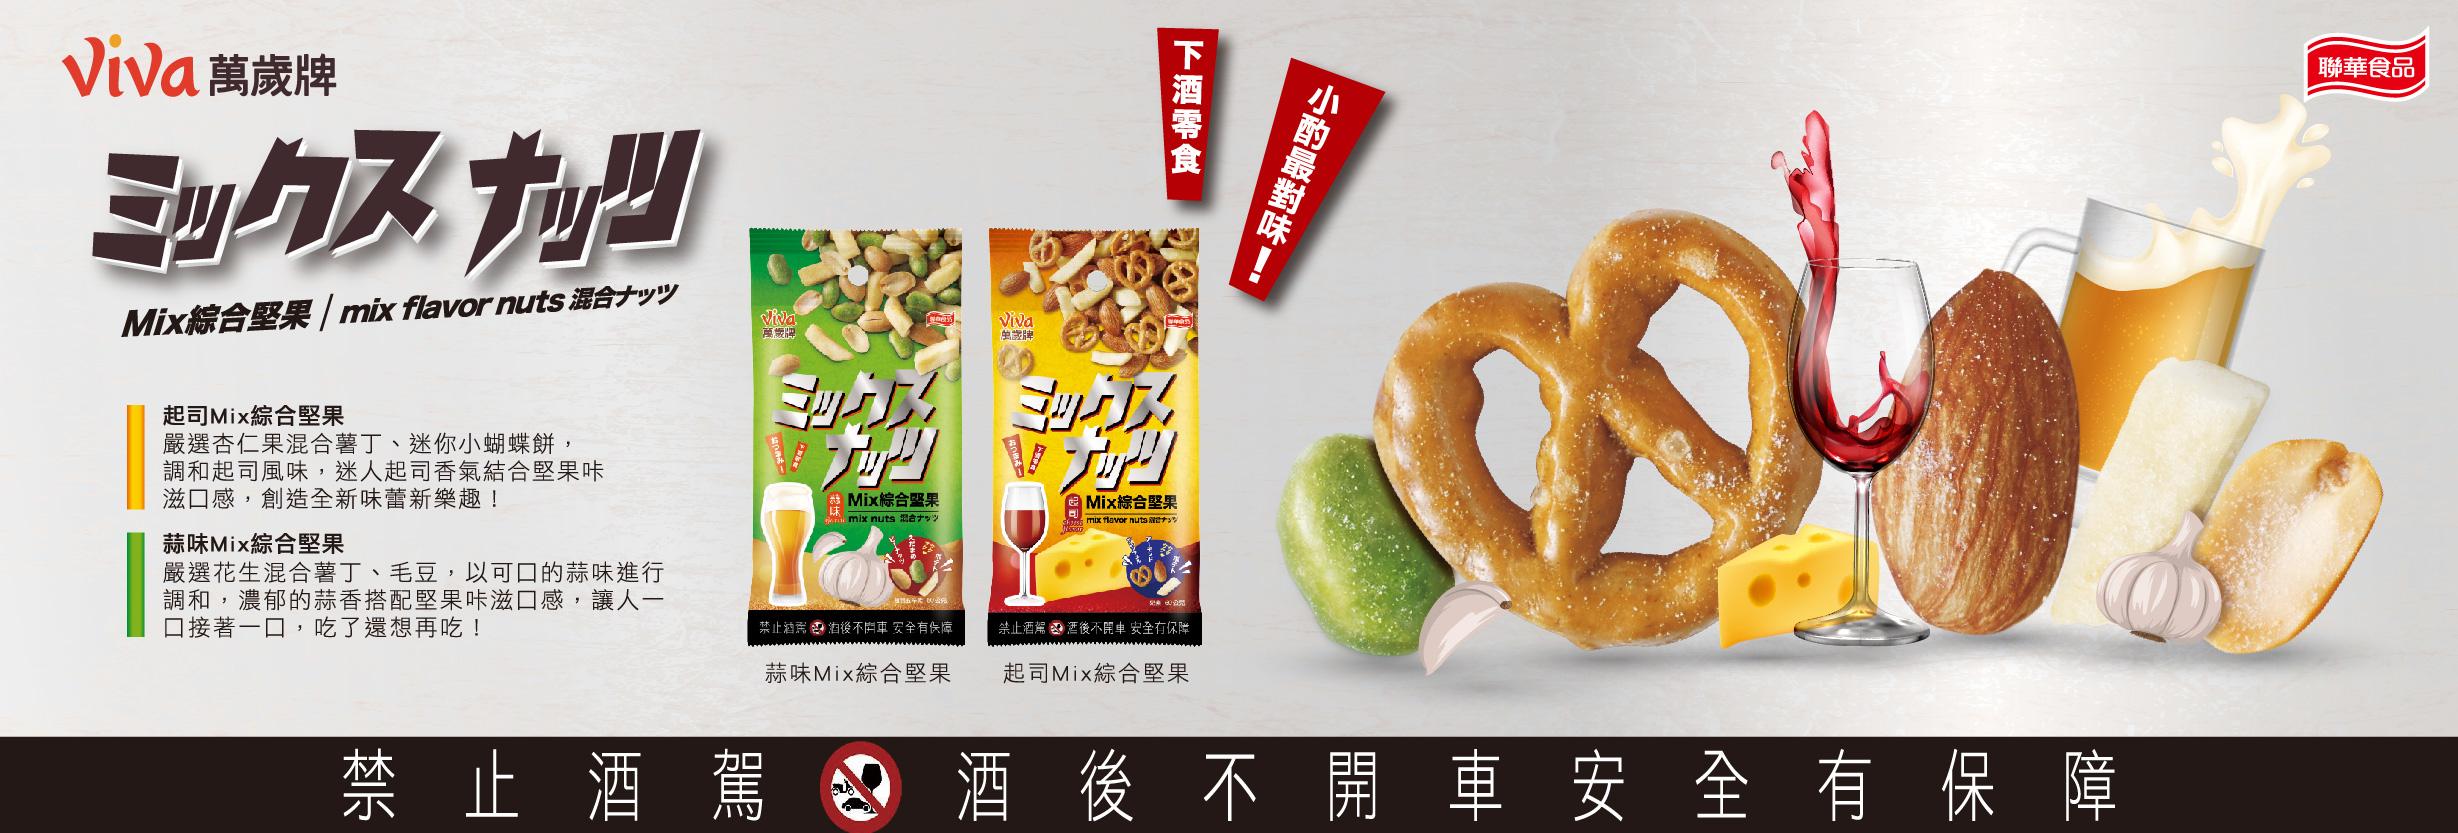 Viva萬歲牌 MIX綜合堅果